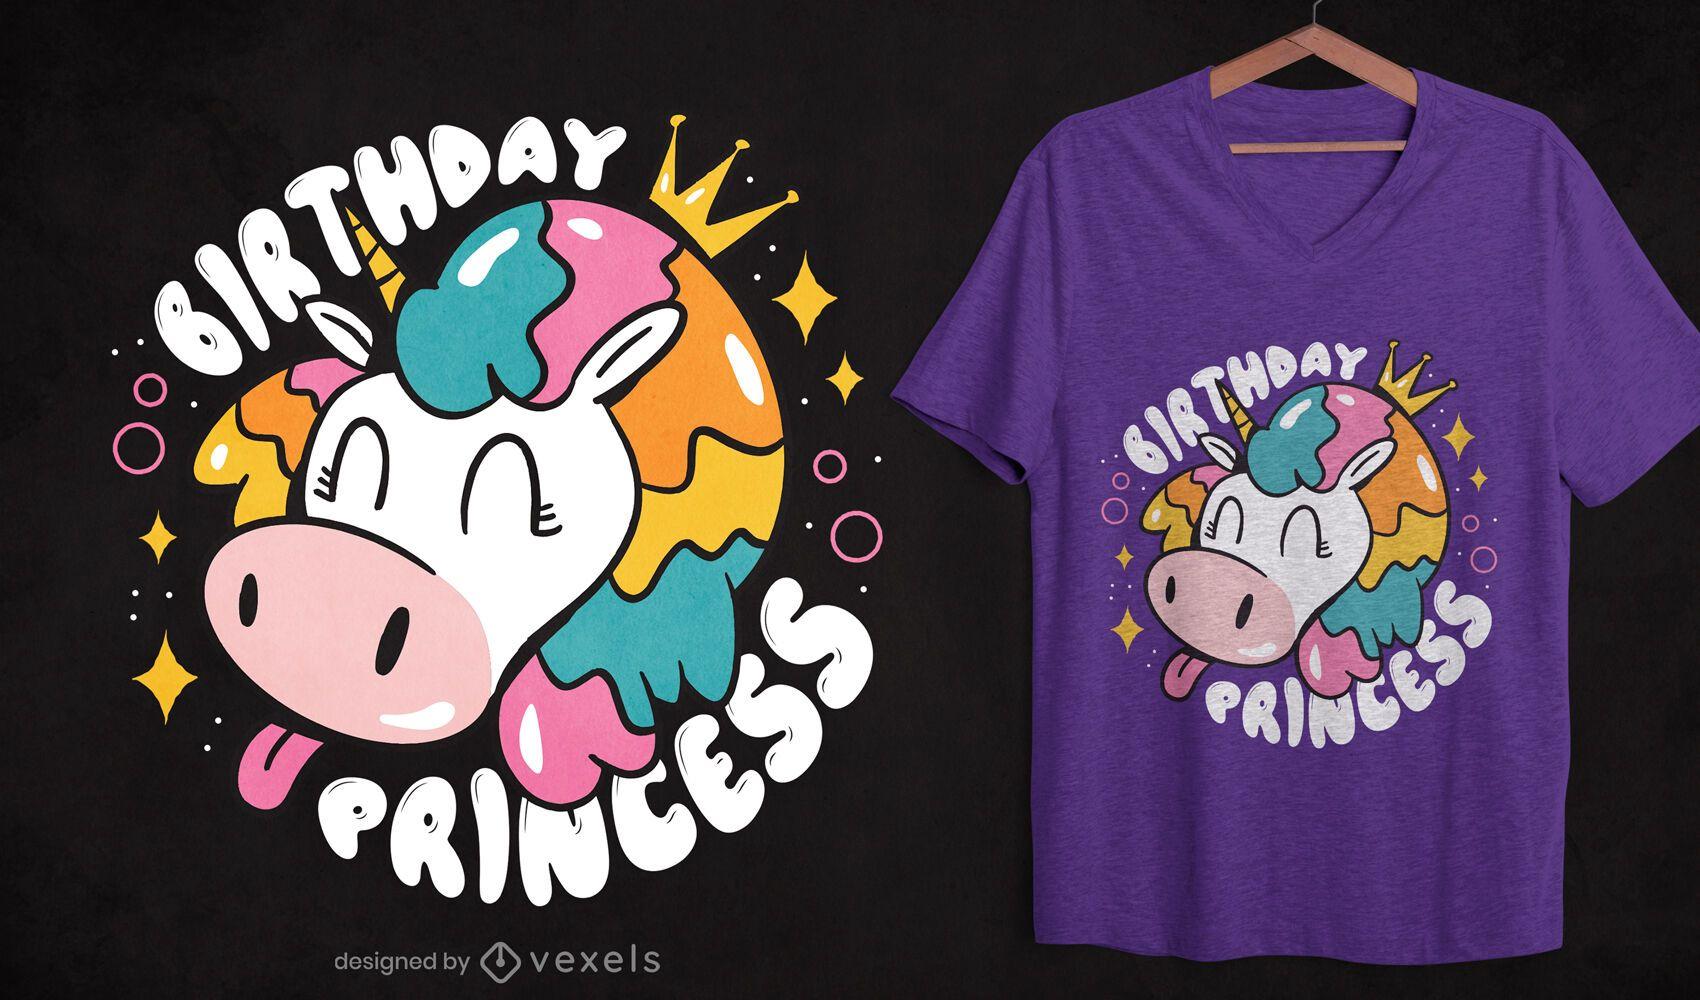 Birthday princess unicorn t-shirt design